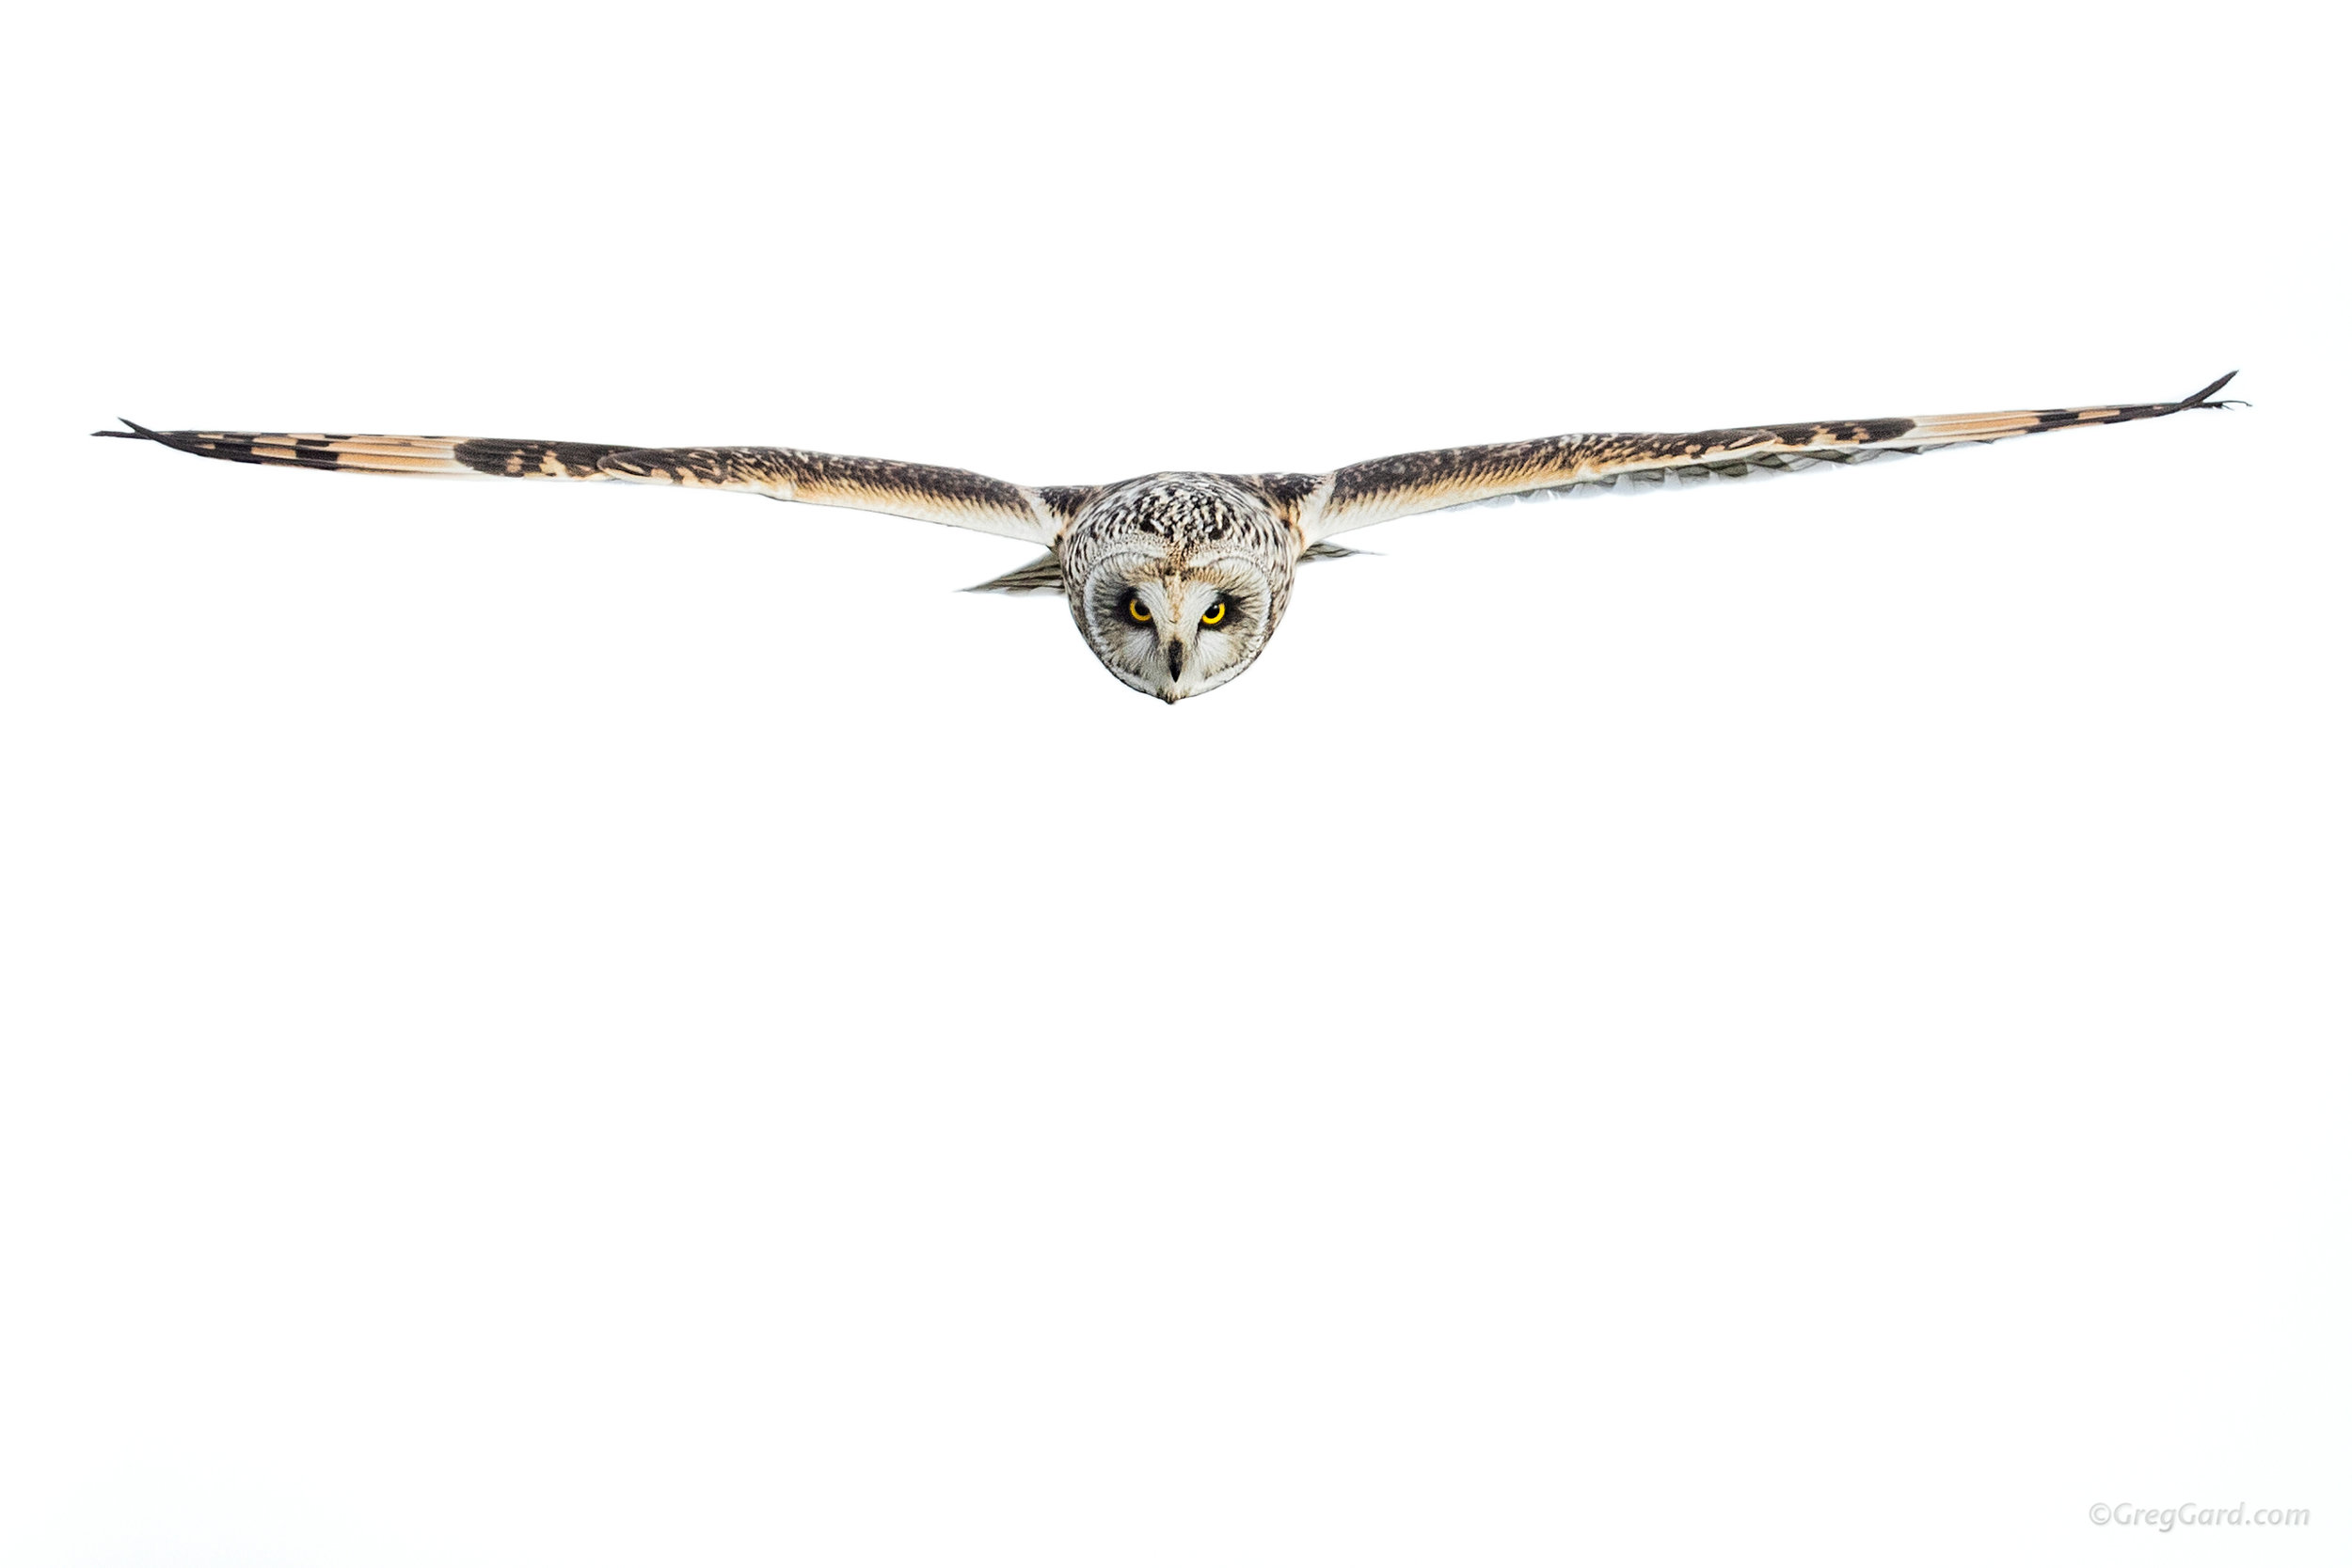 Short-eared Owl on a hunt